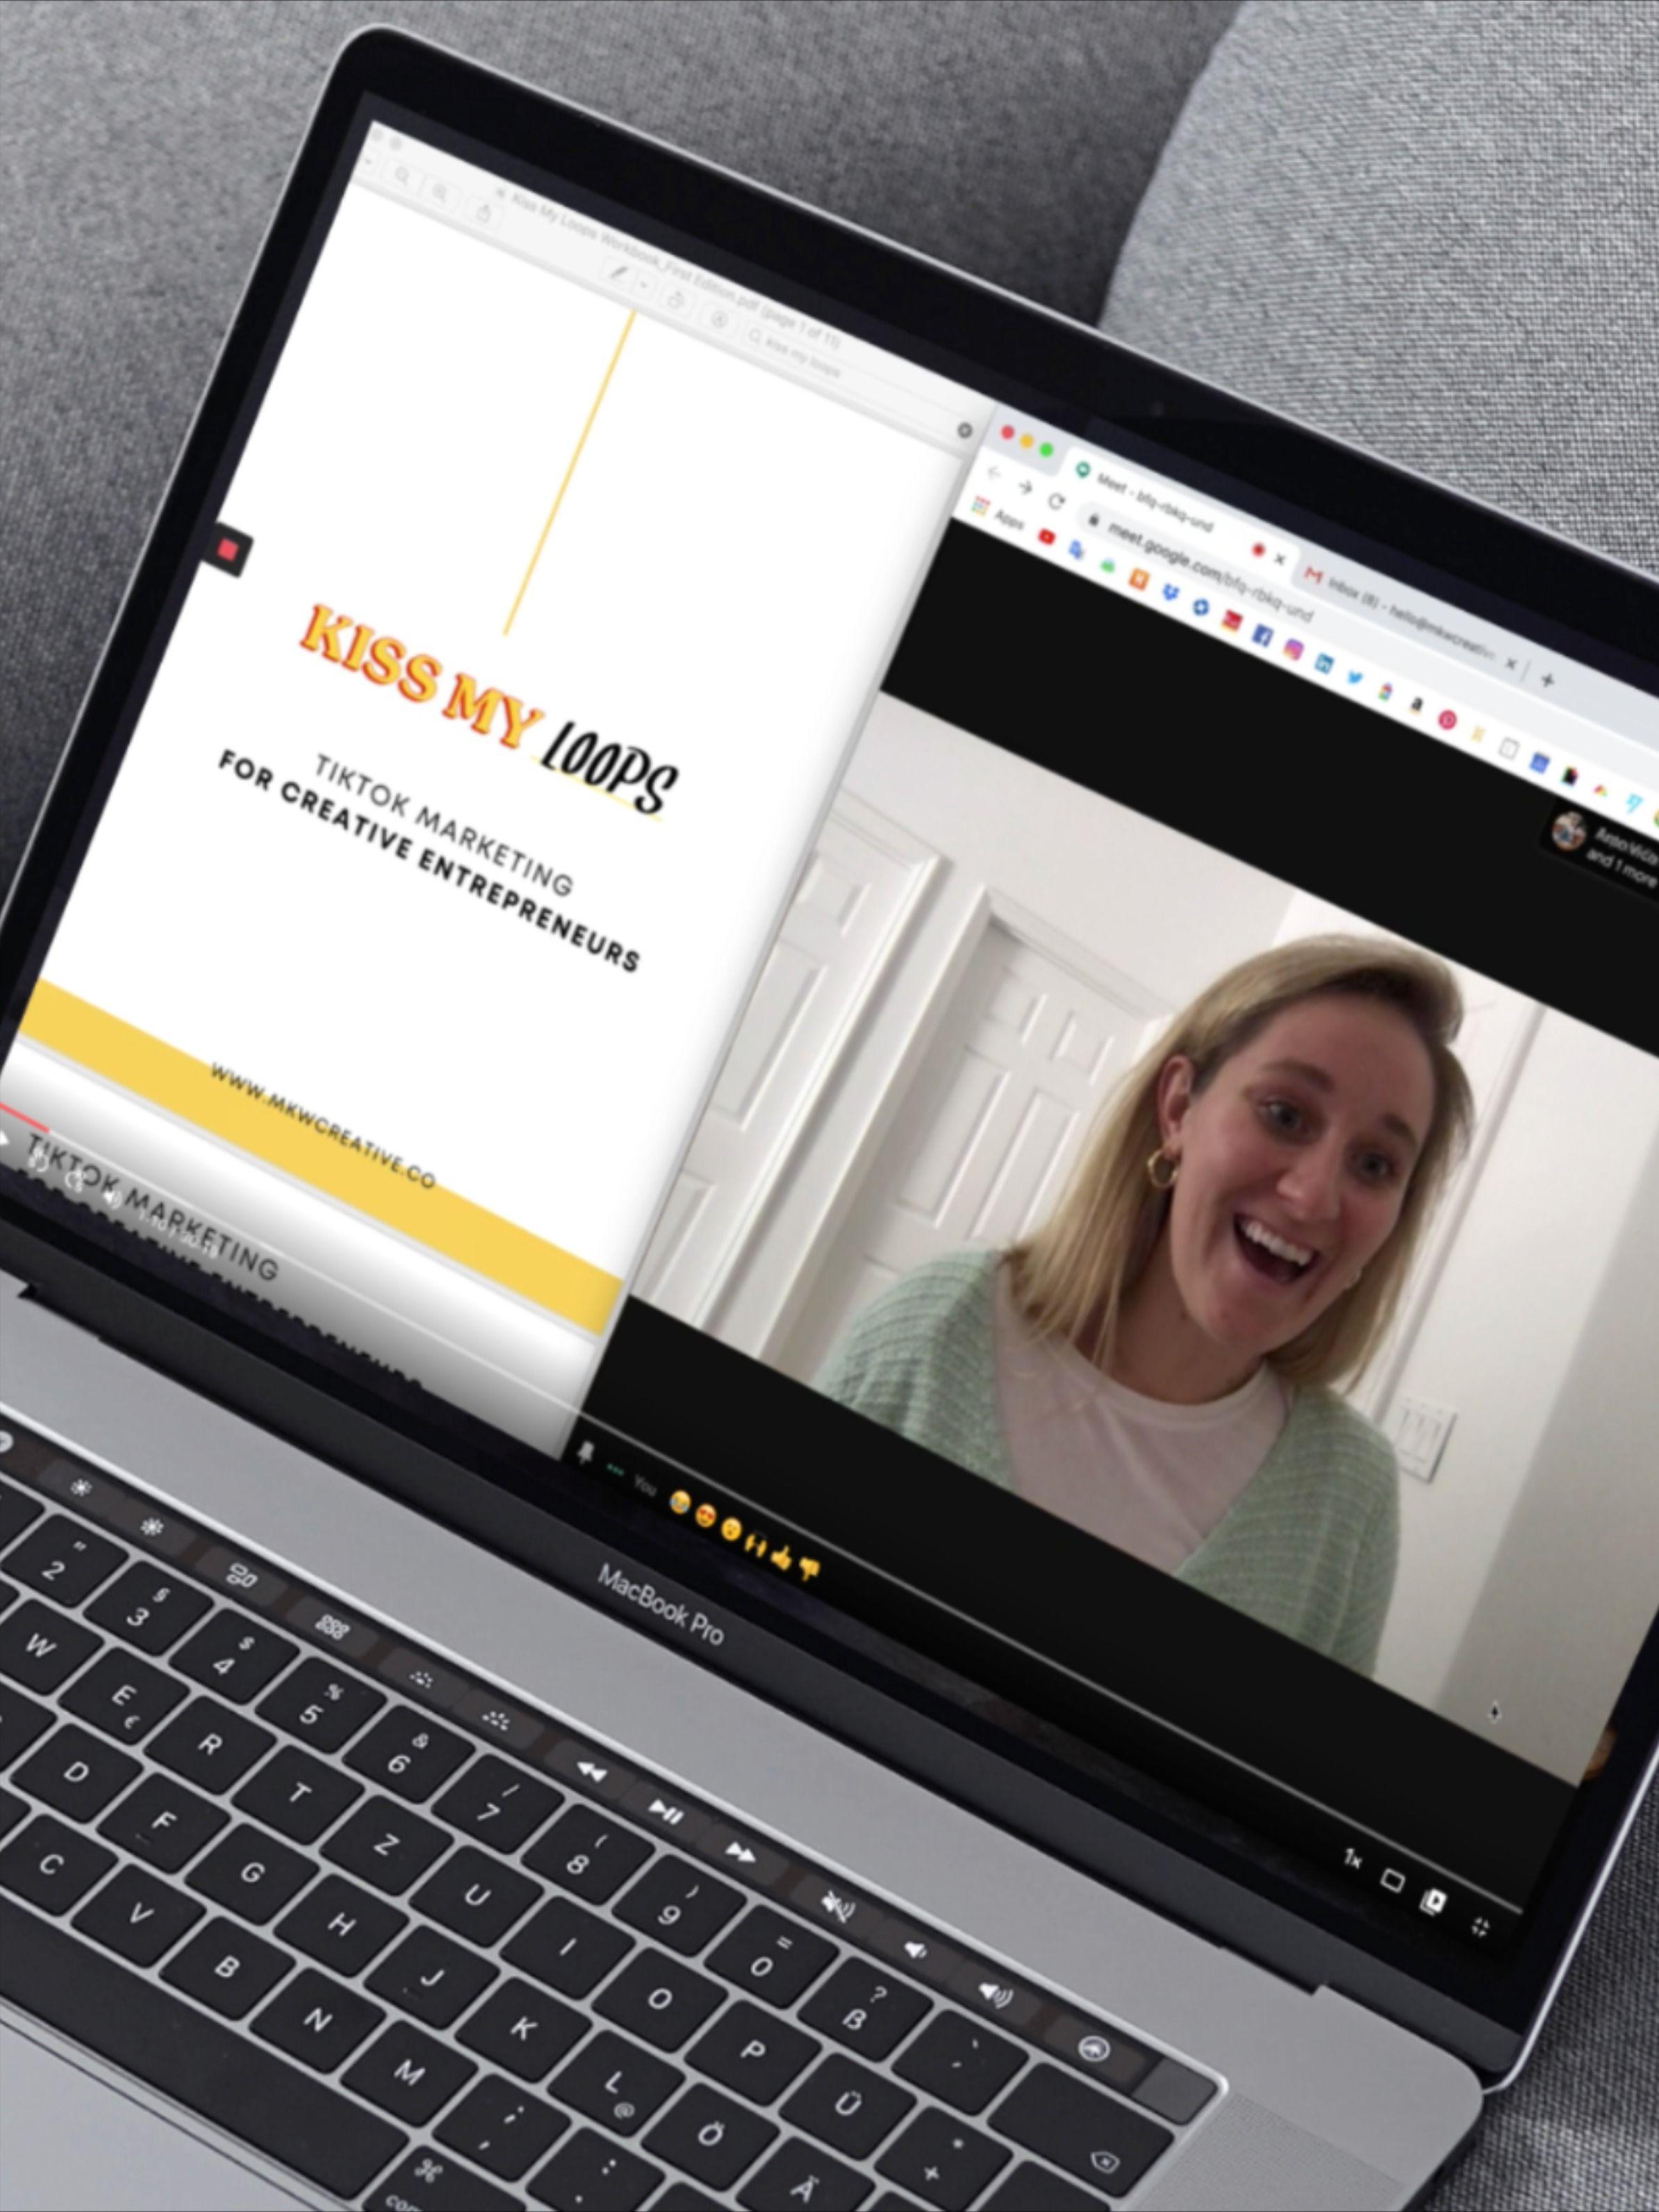 Tiktok For Business Video Training Mkw Creative Co Business Video Video Marketing Social Media Advice